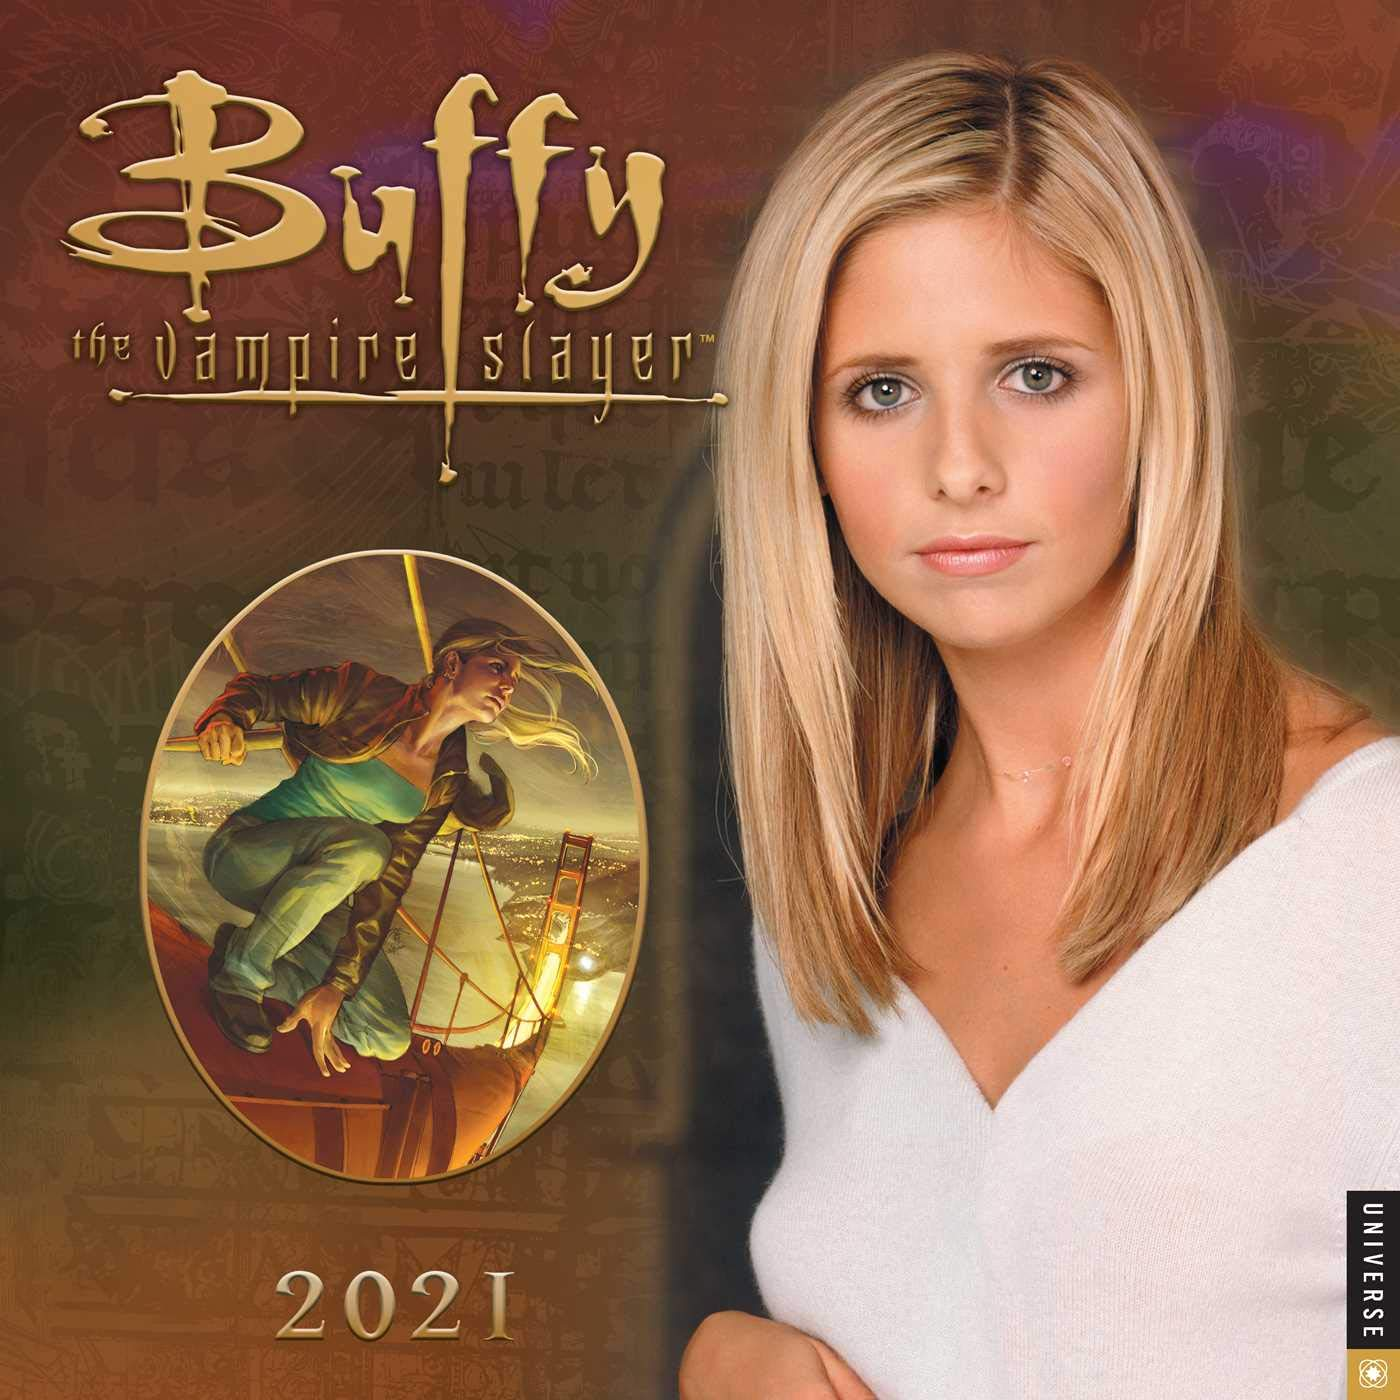 Buffy the Vampire Slayer 2021 Wall Calendar: 20th Century Studios